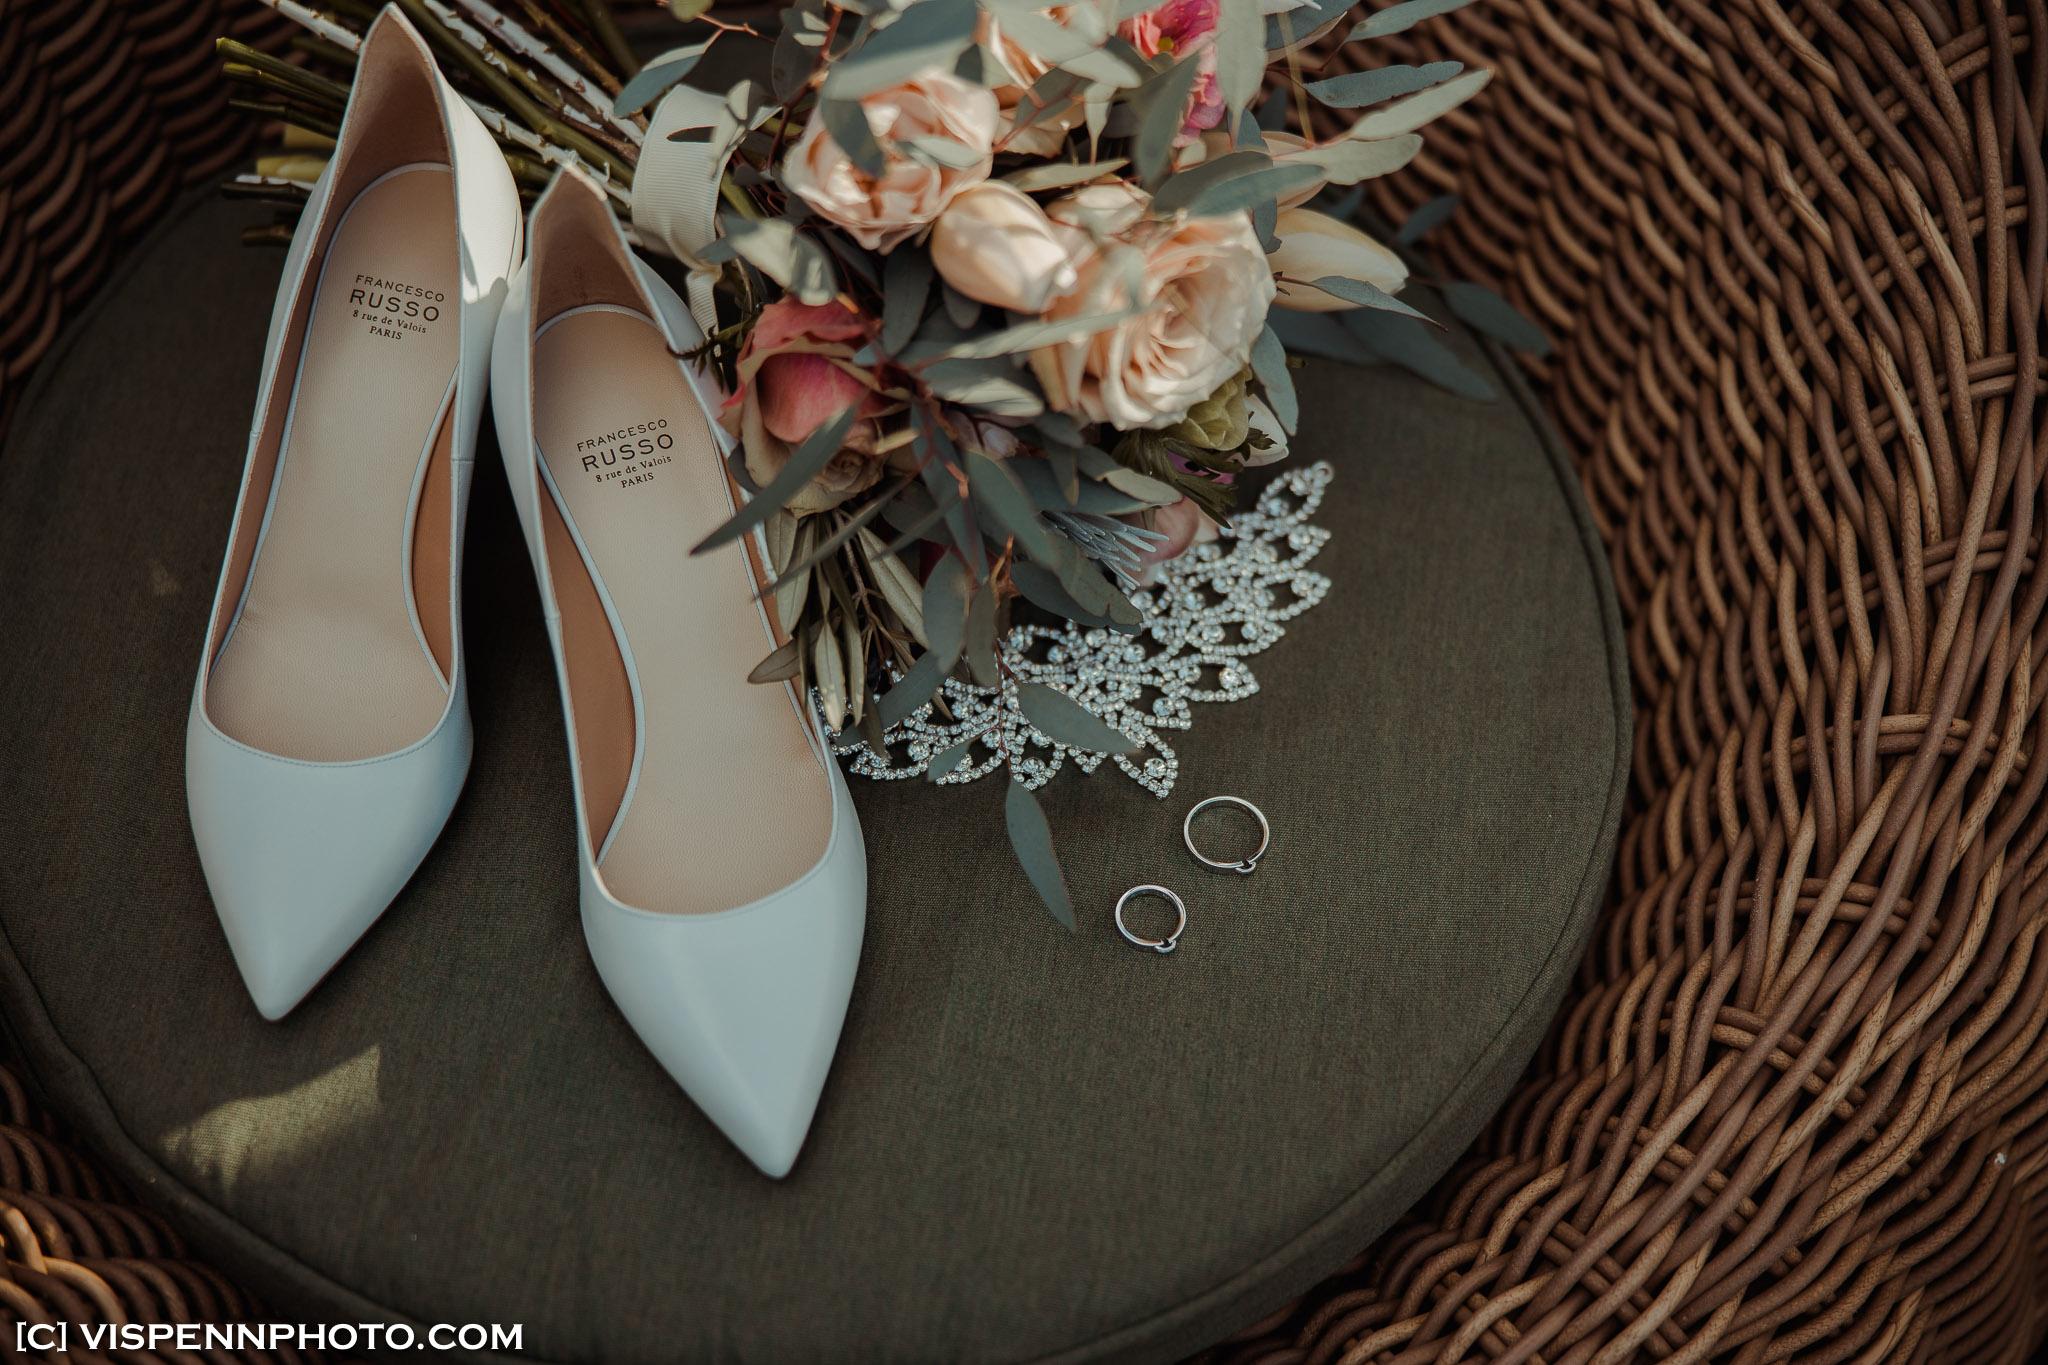 WEDDING DAY Photography Melbourne CoreyCoco 1P 01786 EOSR ZHPENN